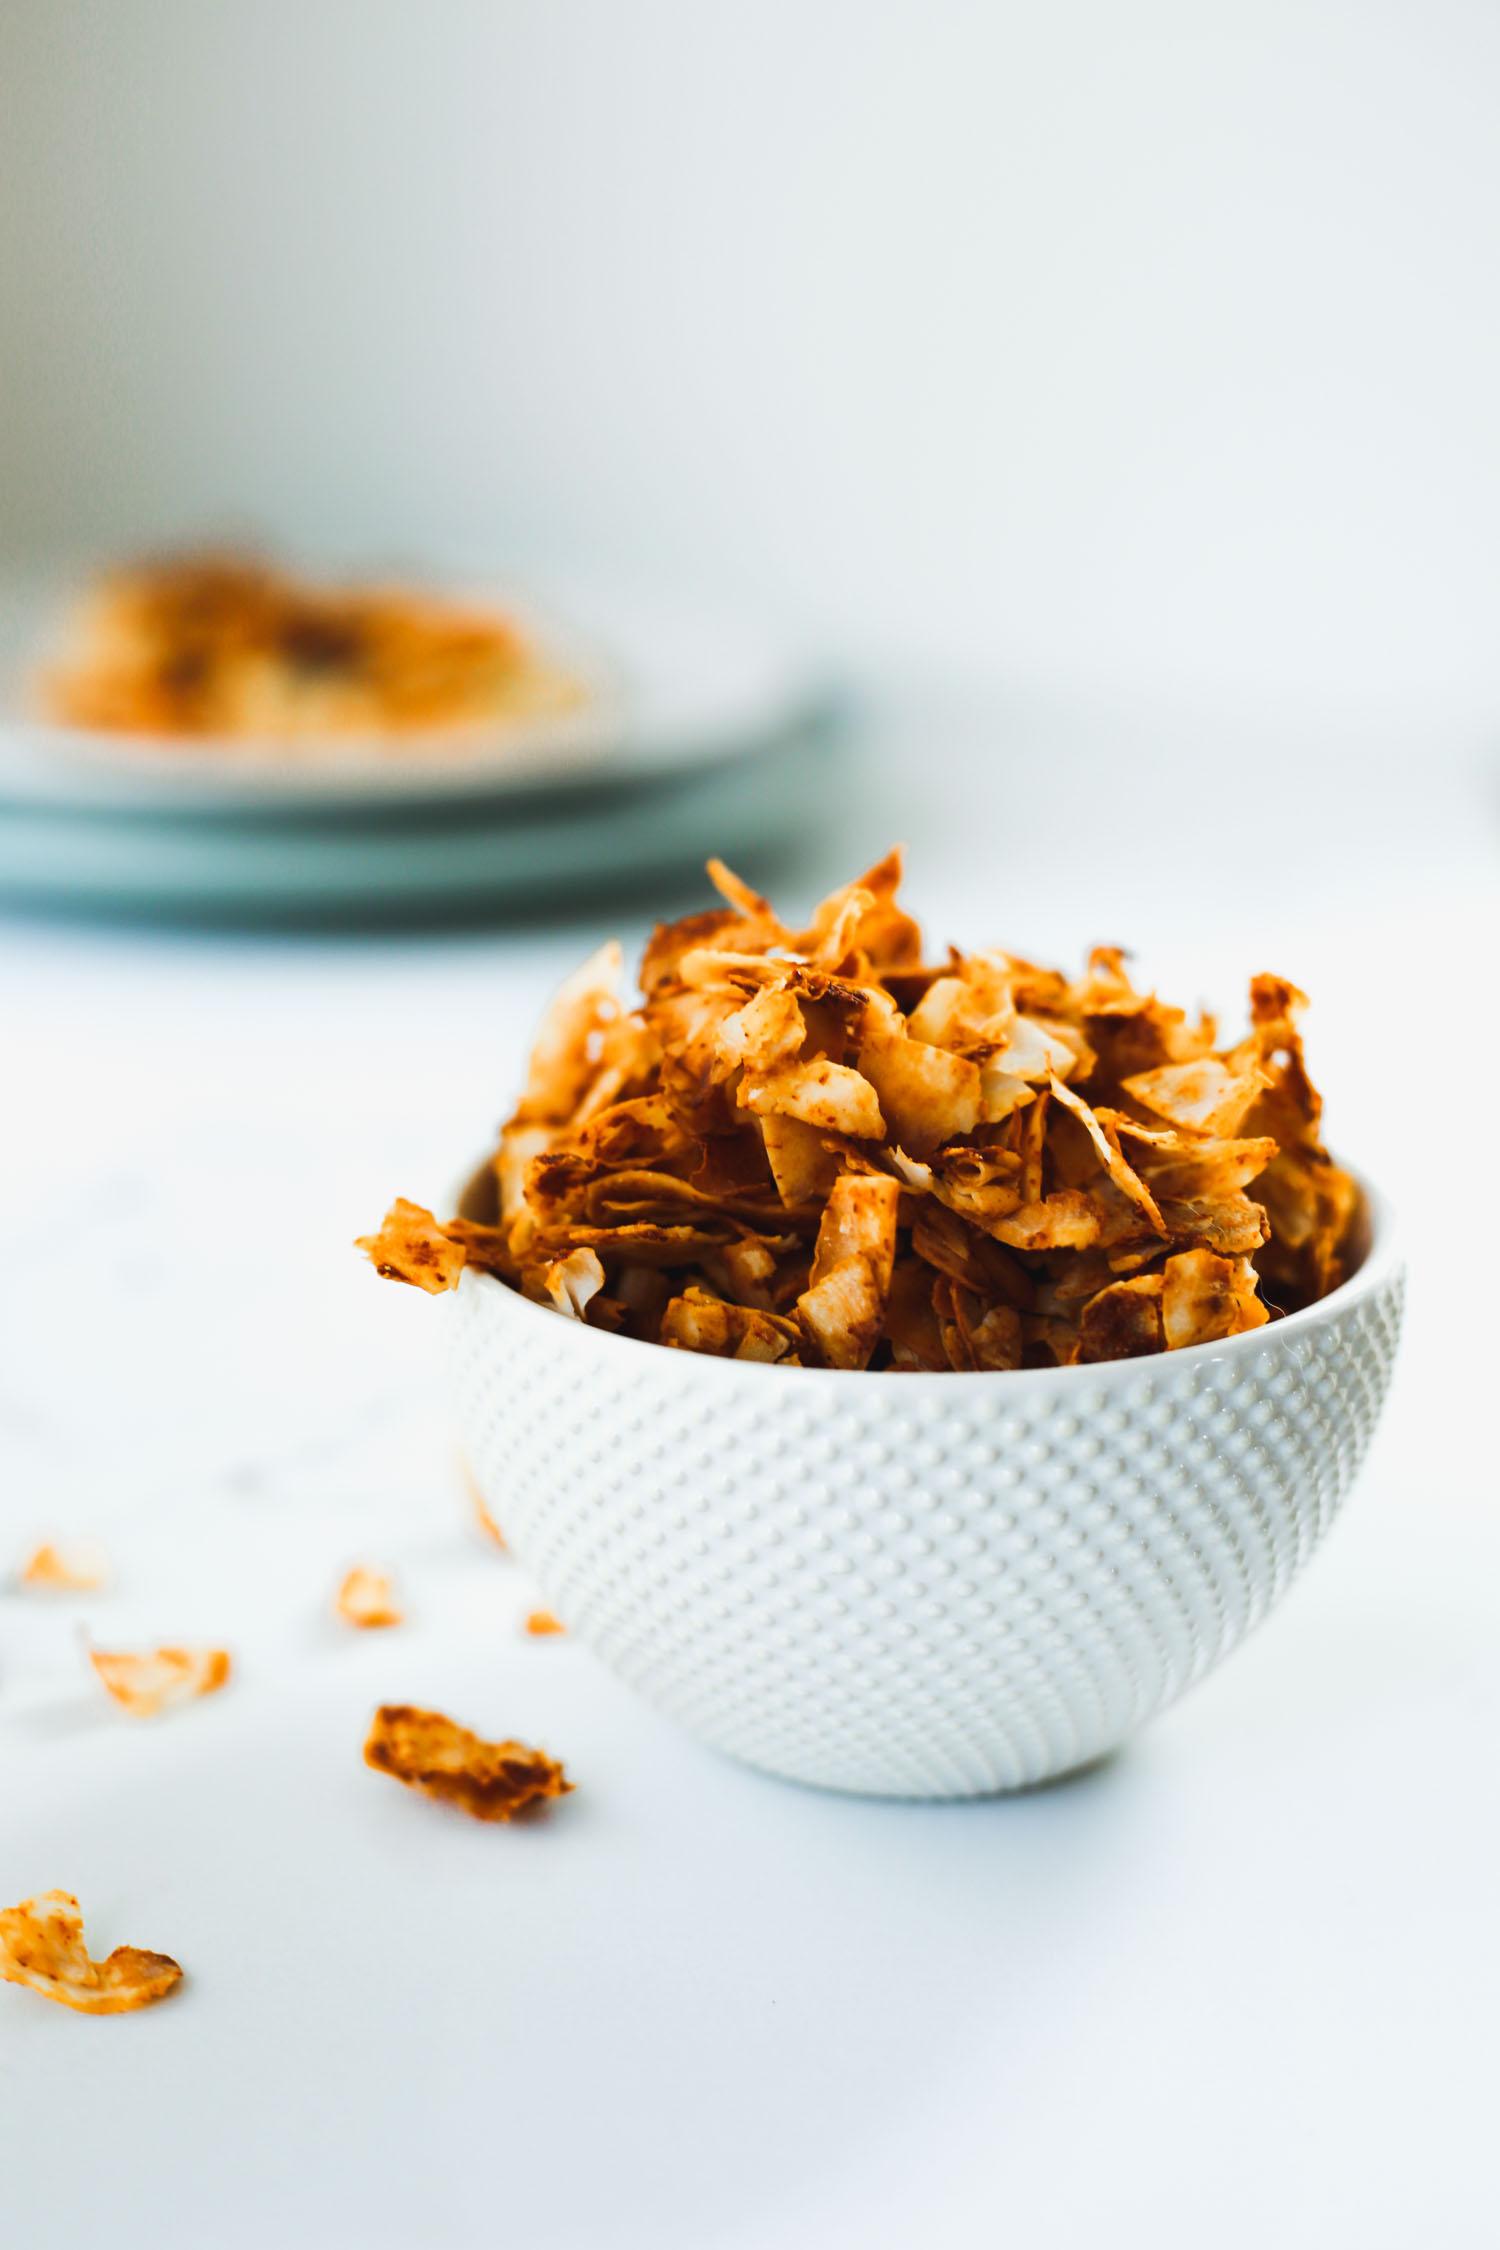 4-Ingredient Coconut Bakin   A Quick & Easy, Delicious Alternative to Bacon